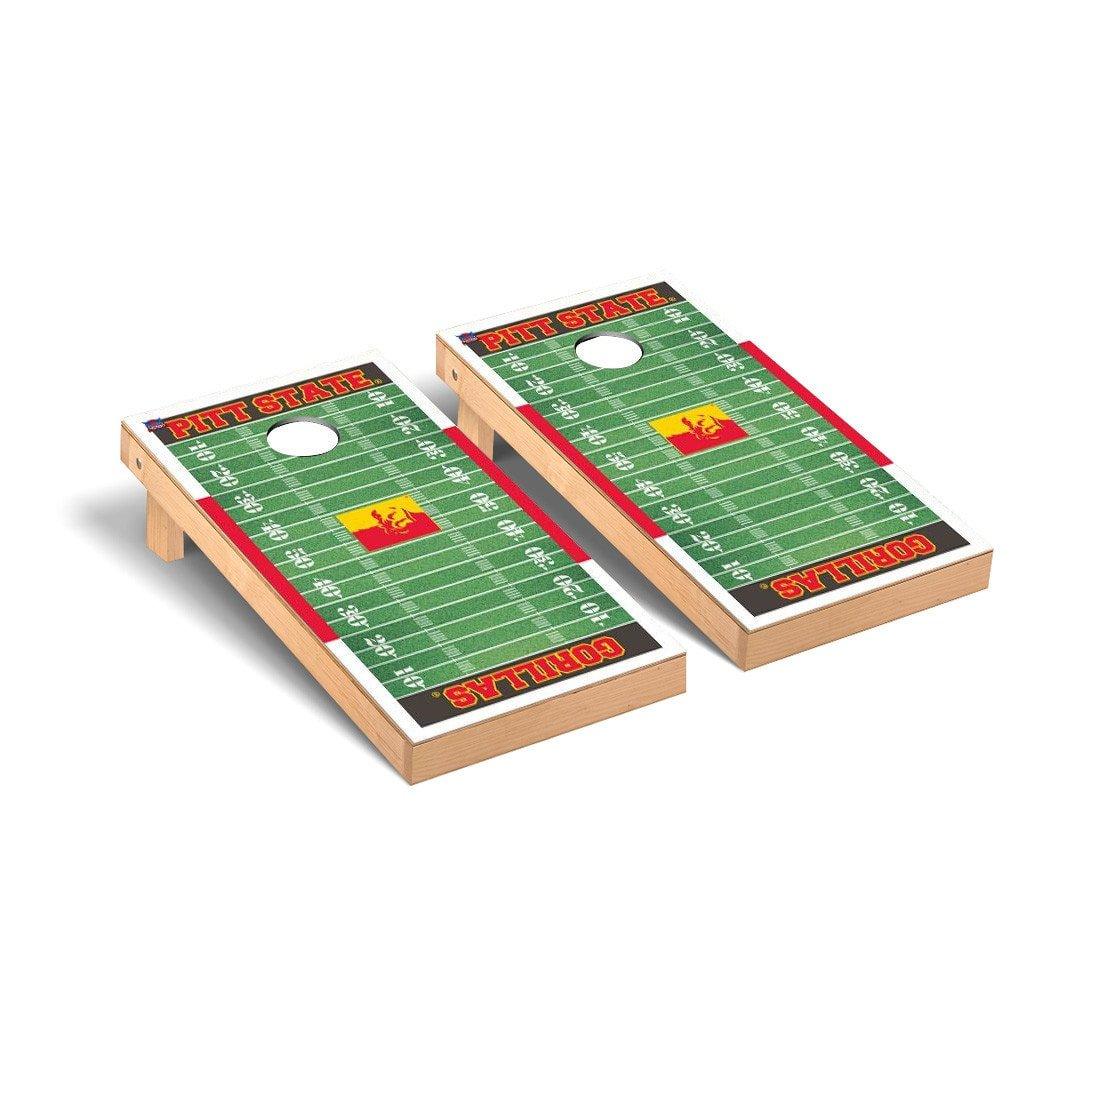 Pittsburg State University Gorillas Cornhole Game Set B01133TS4Q マルチカラー マルチカラー